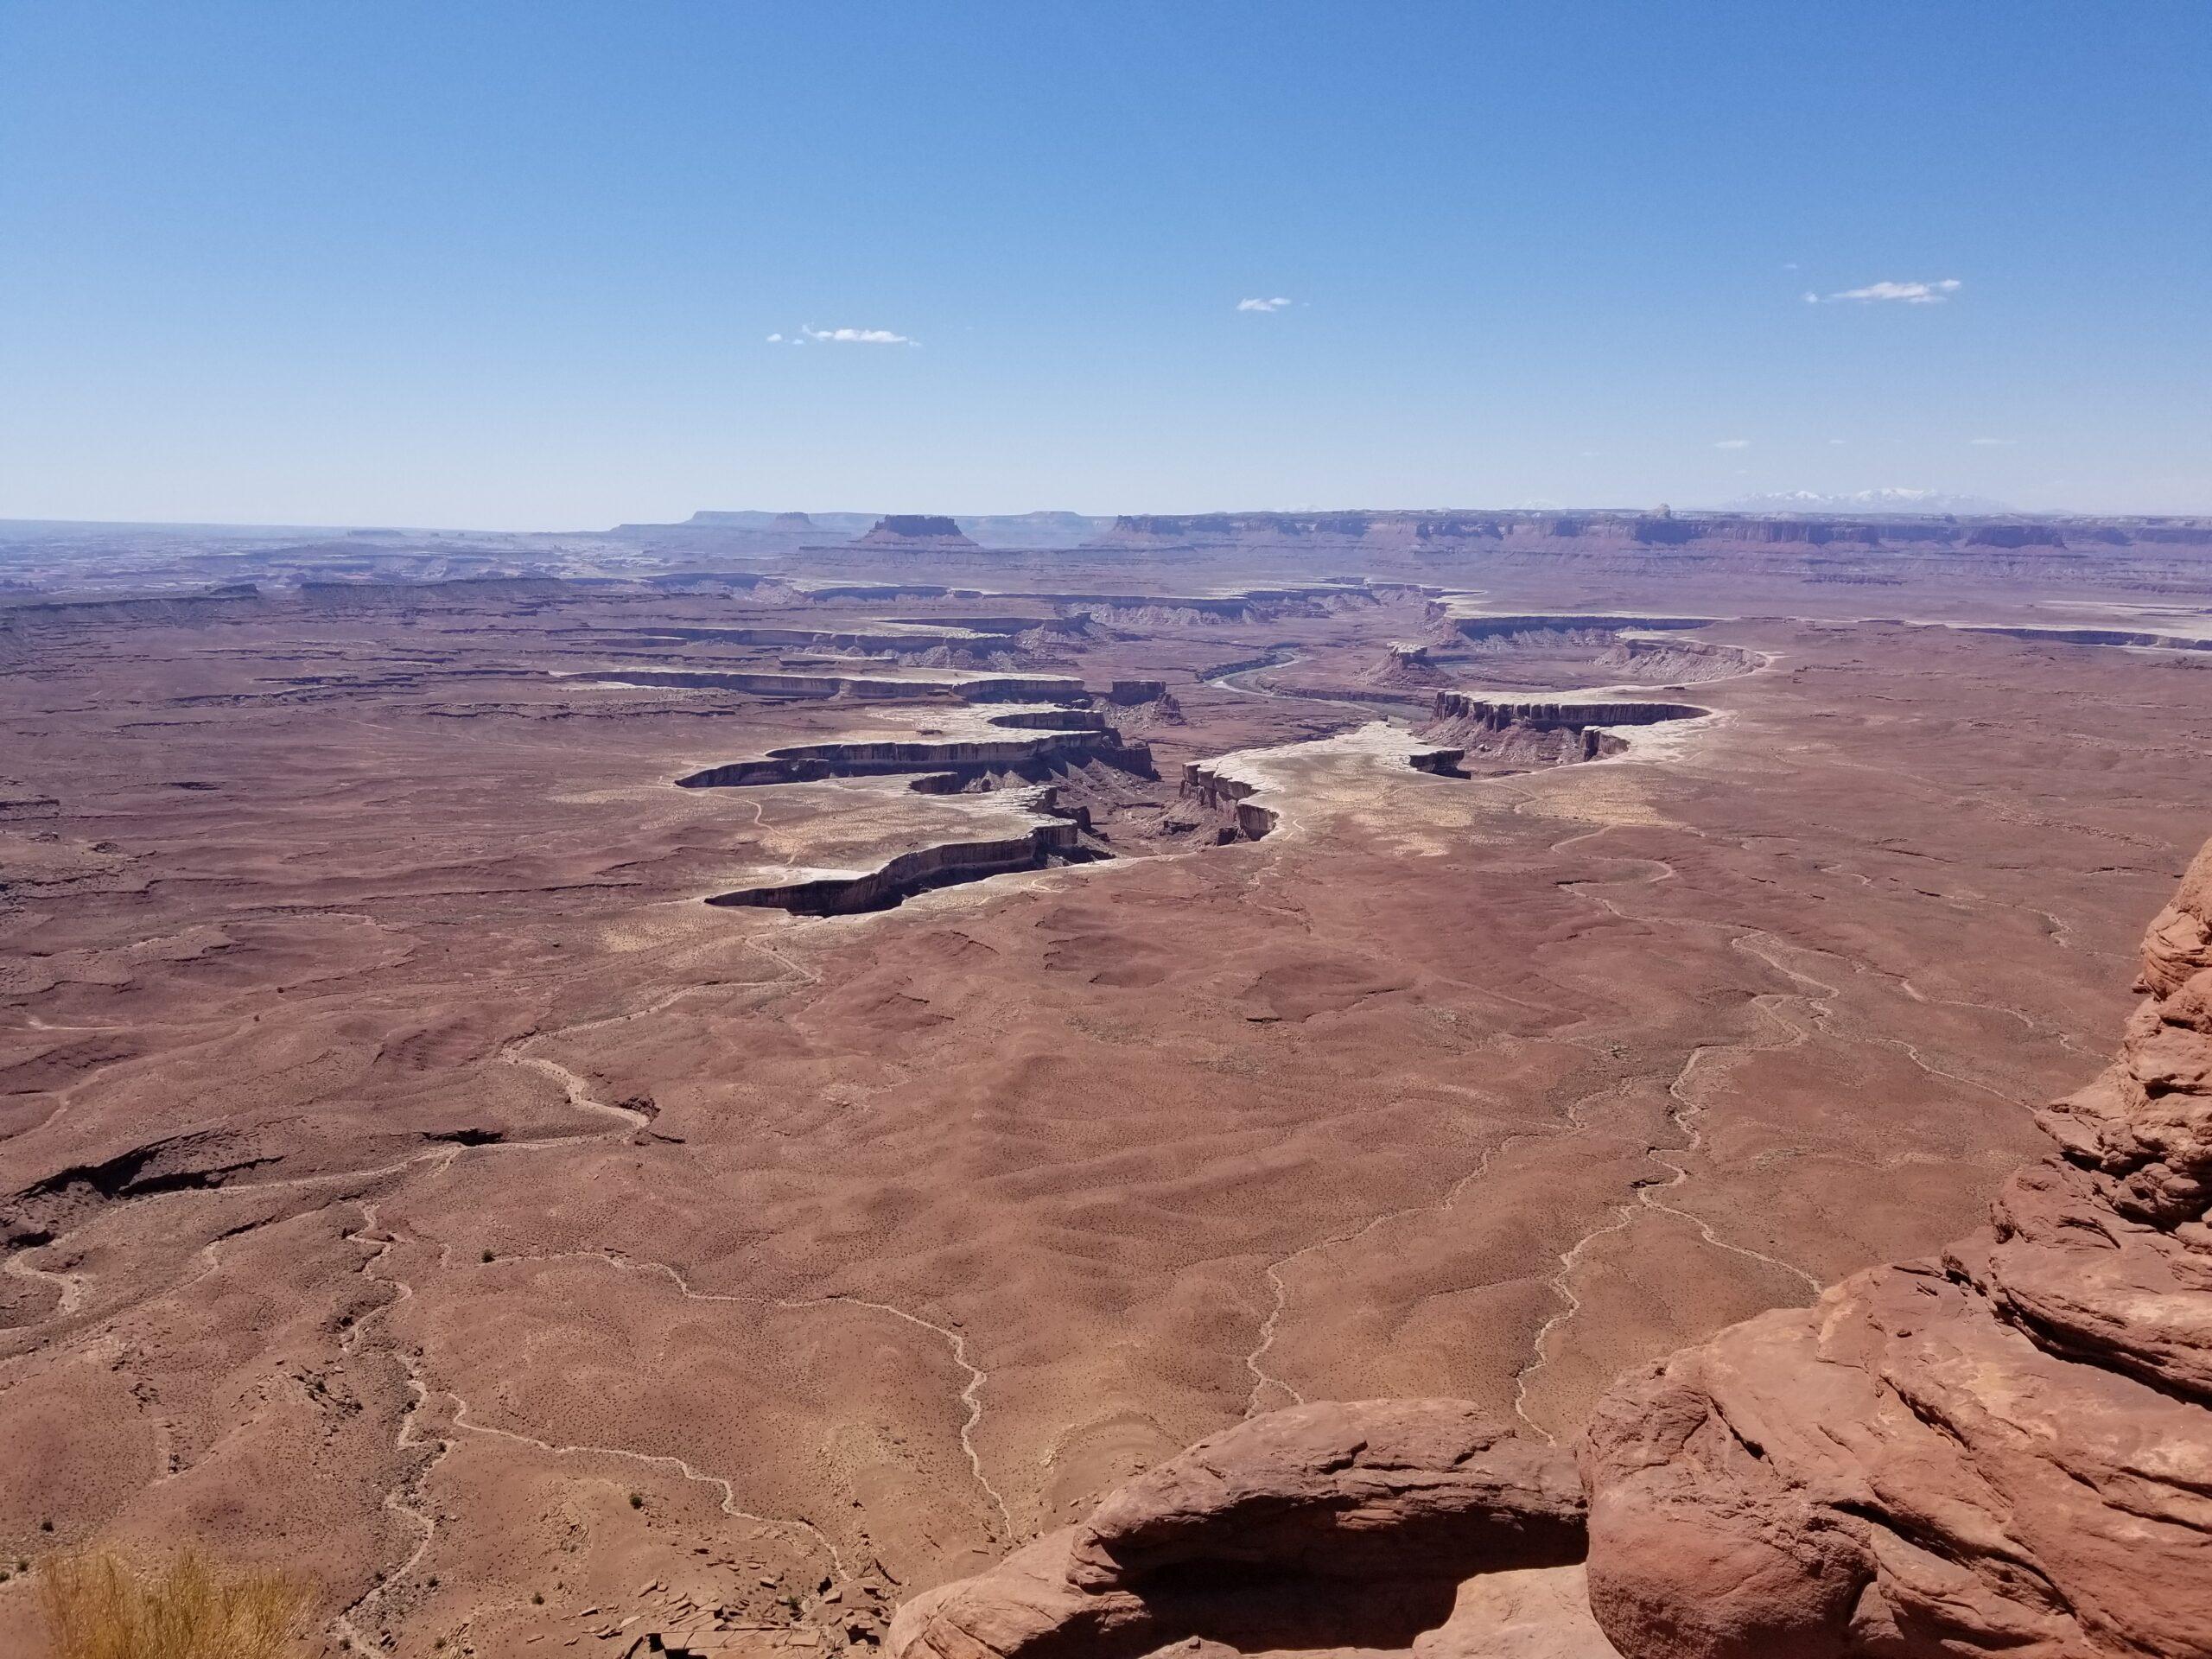 CanyonlandsVista8